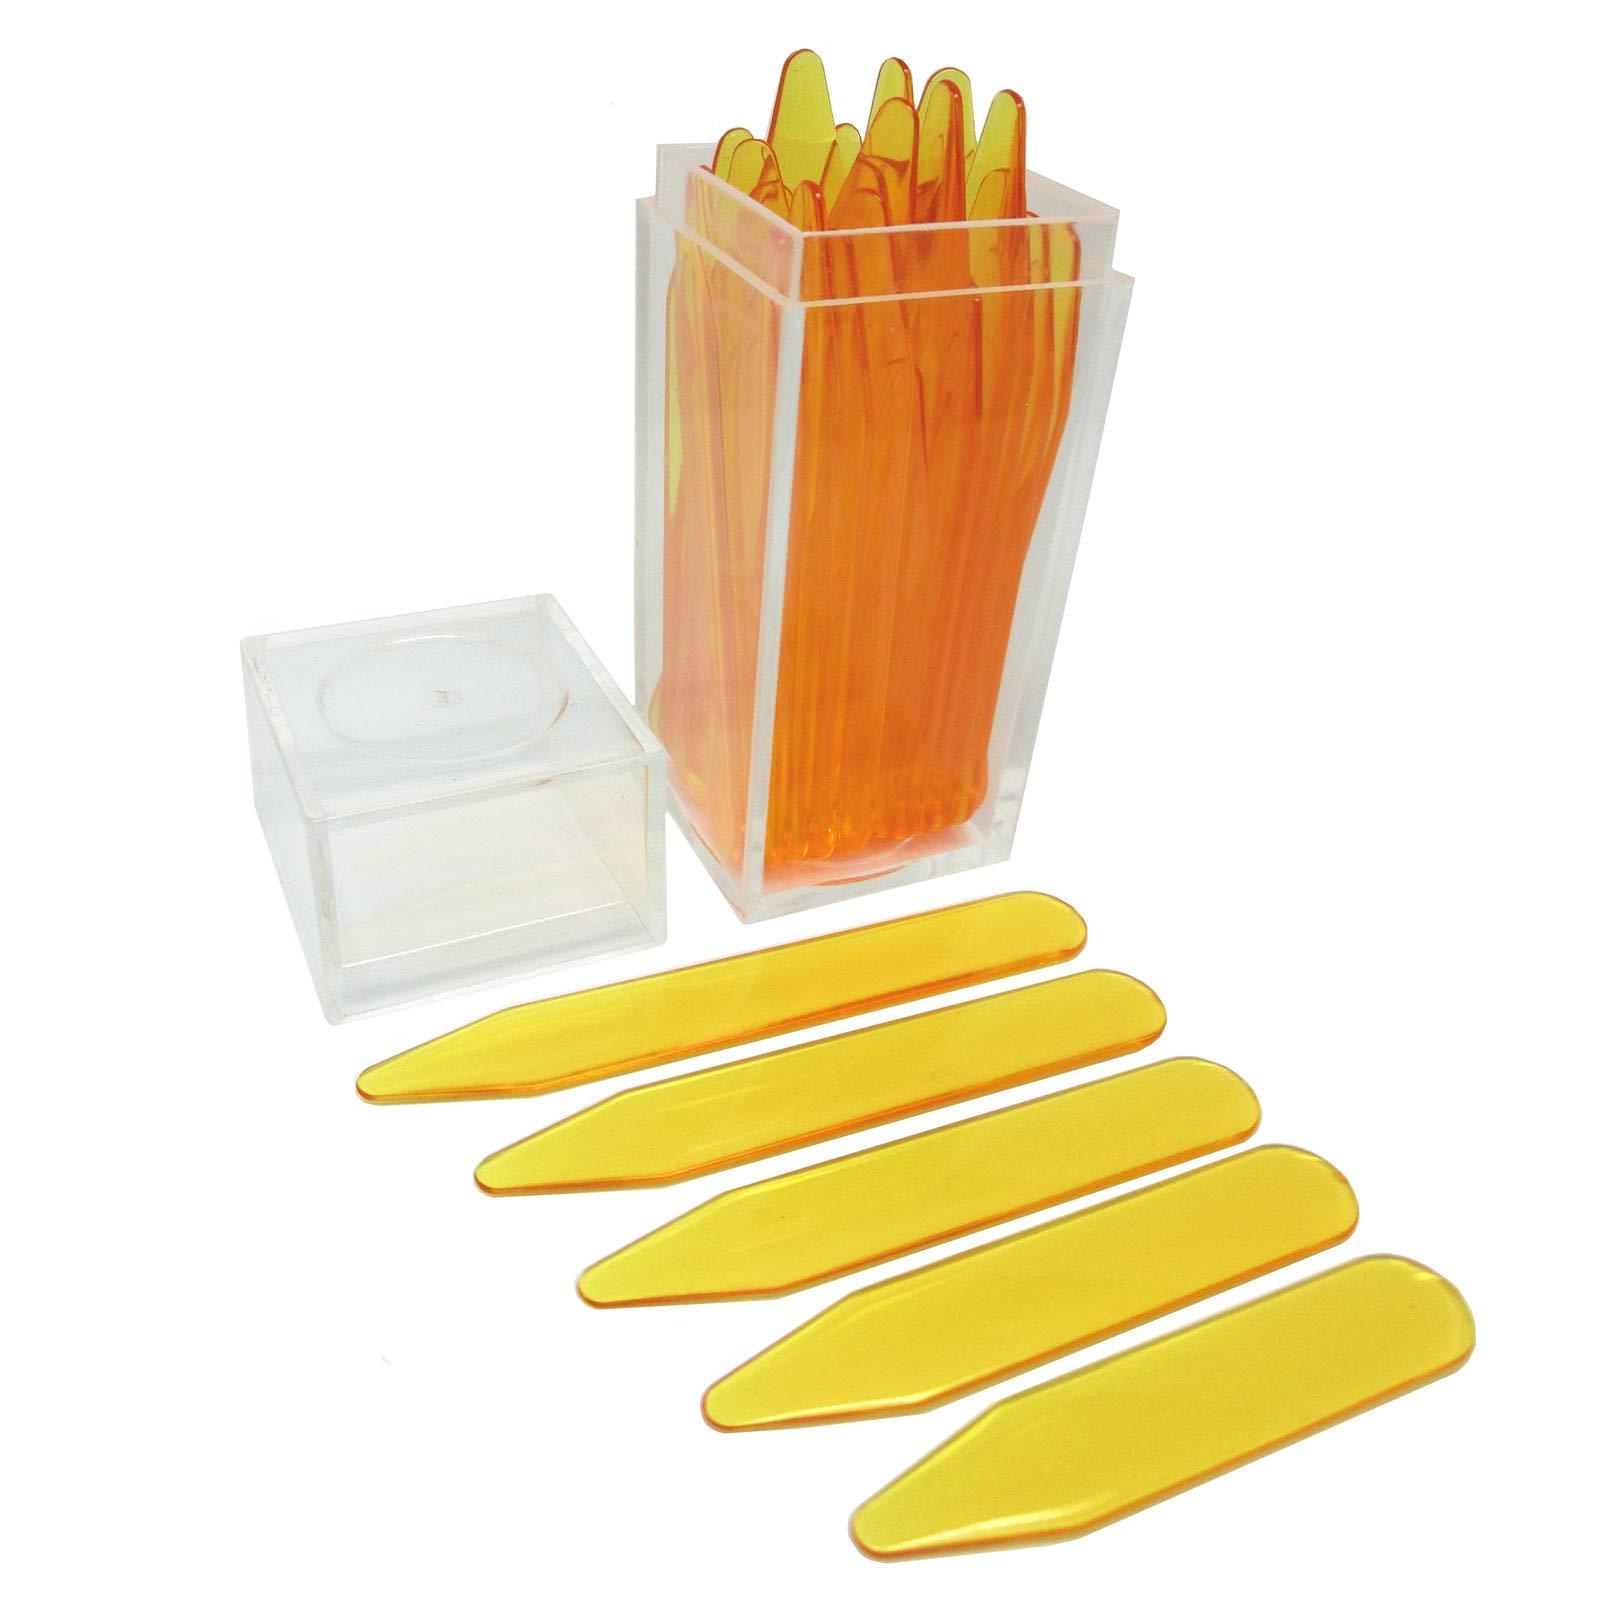 Shang Zun 30 Pcs Orange Plastic Collar Stays in Clear Box, 5 Sizes